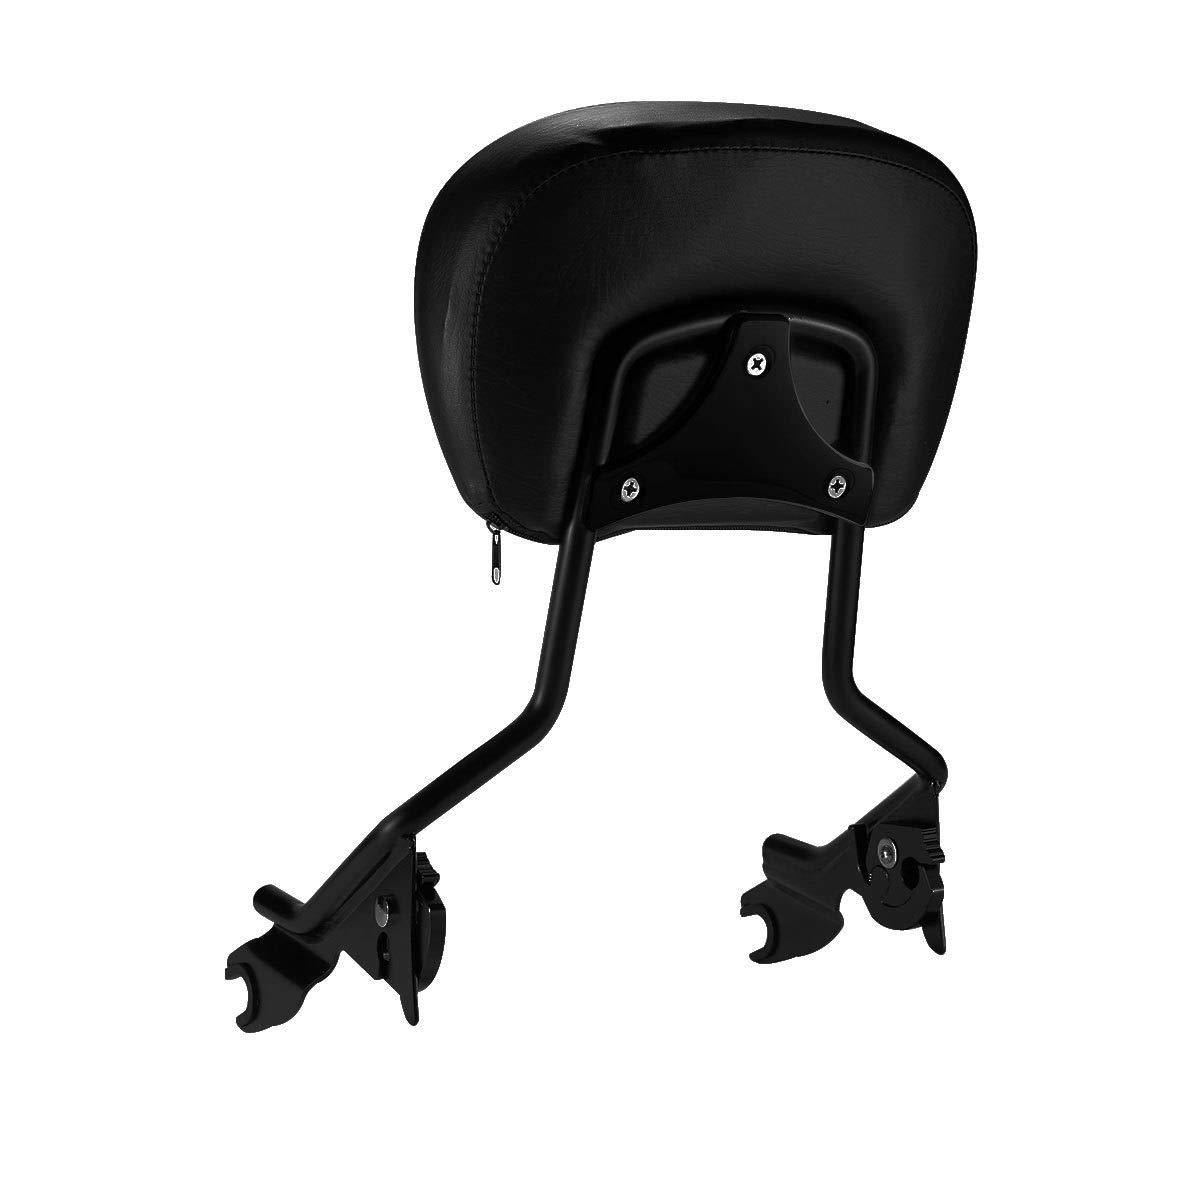 XFMT H-D Detachables Sissy Bar Upright Backrest Sissy Bar For Harley Touring Street Glide Road King 2009-2019